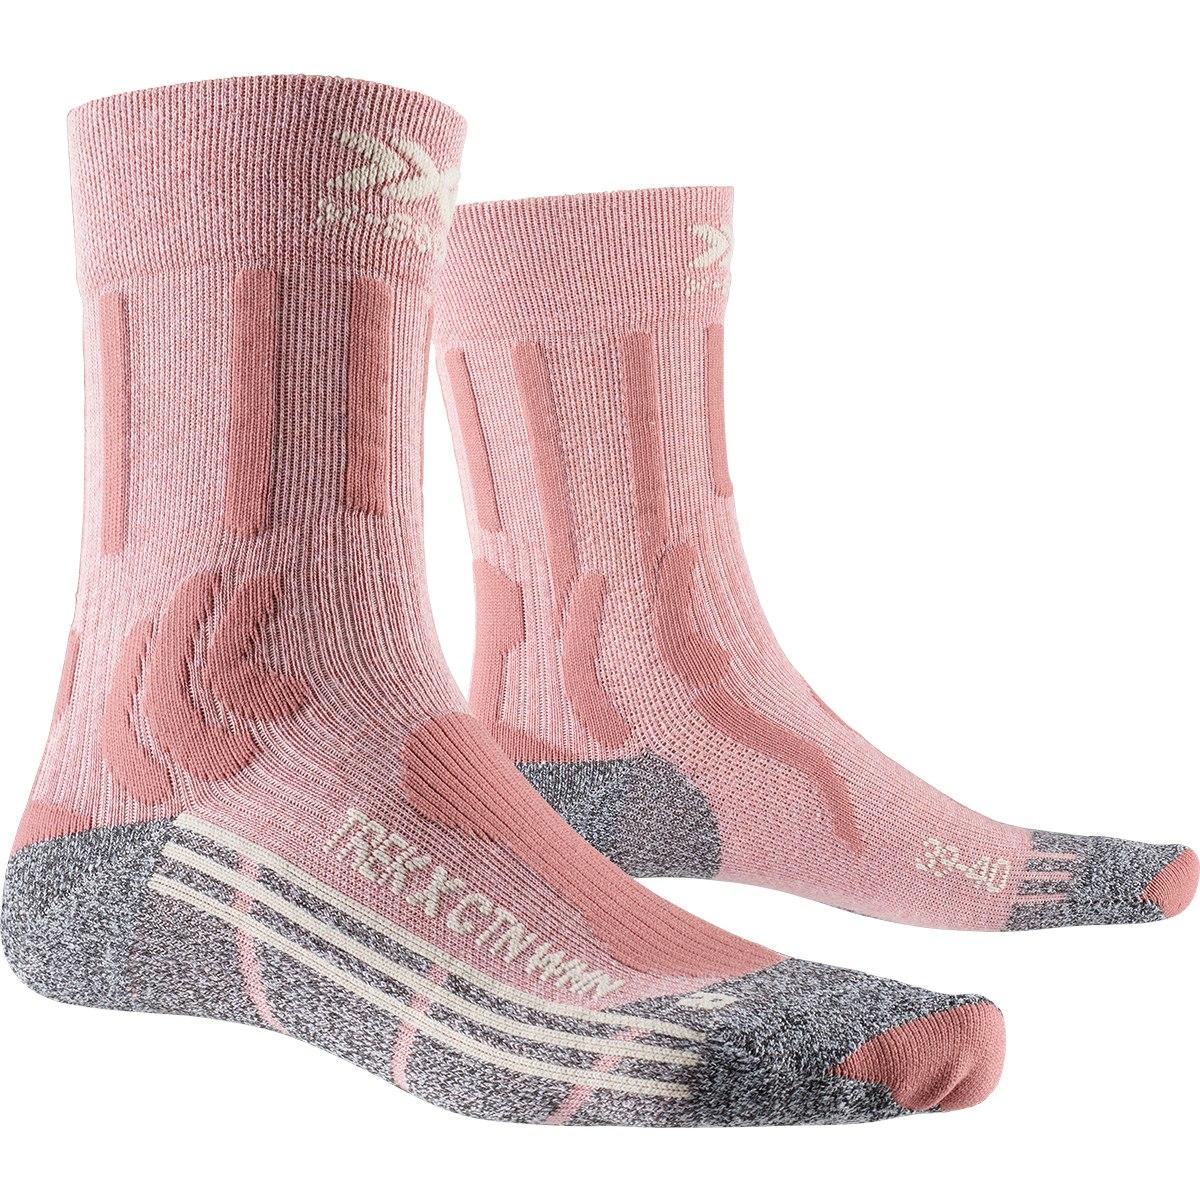 X-Socks Trek X CTN Damen Socken - vintage rose melange/grey melange